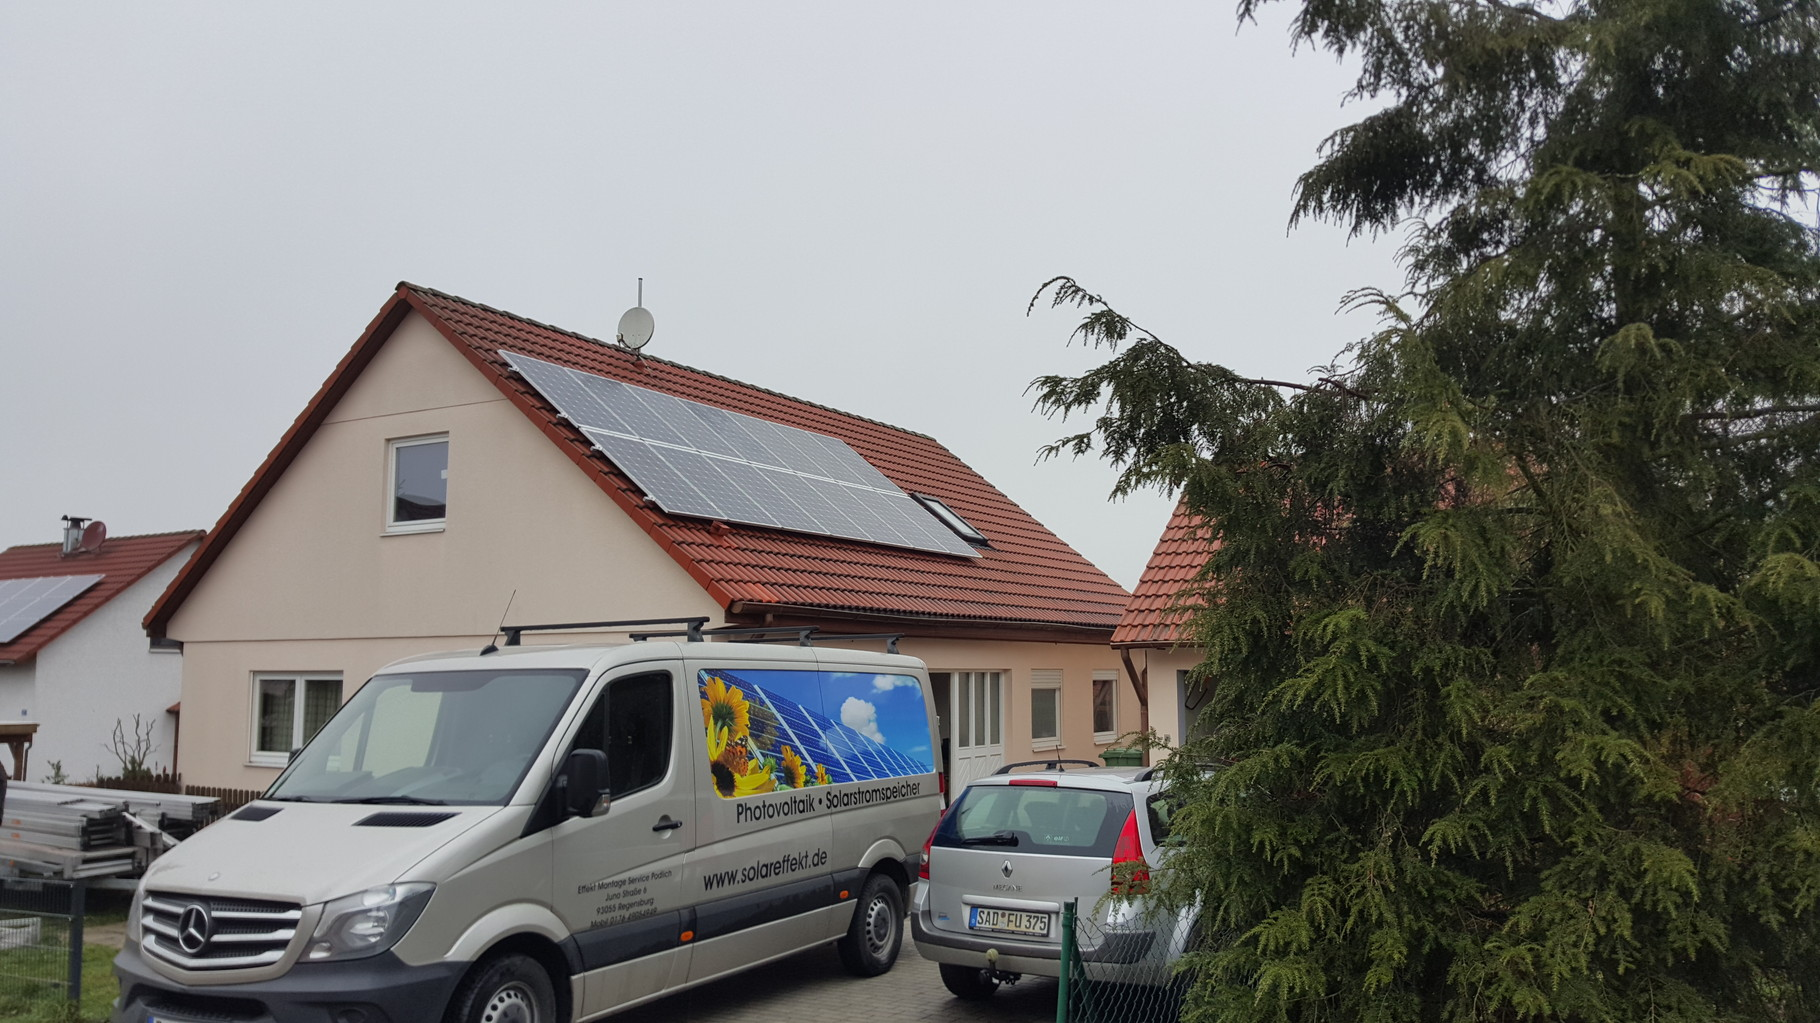 9,88 kWp Photovoltaikanlage 93188 Pielenhofen SolarWorld Modulen mit Senec  7.5 Lithium Batterie in 92551 Stullin